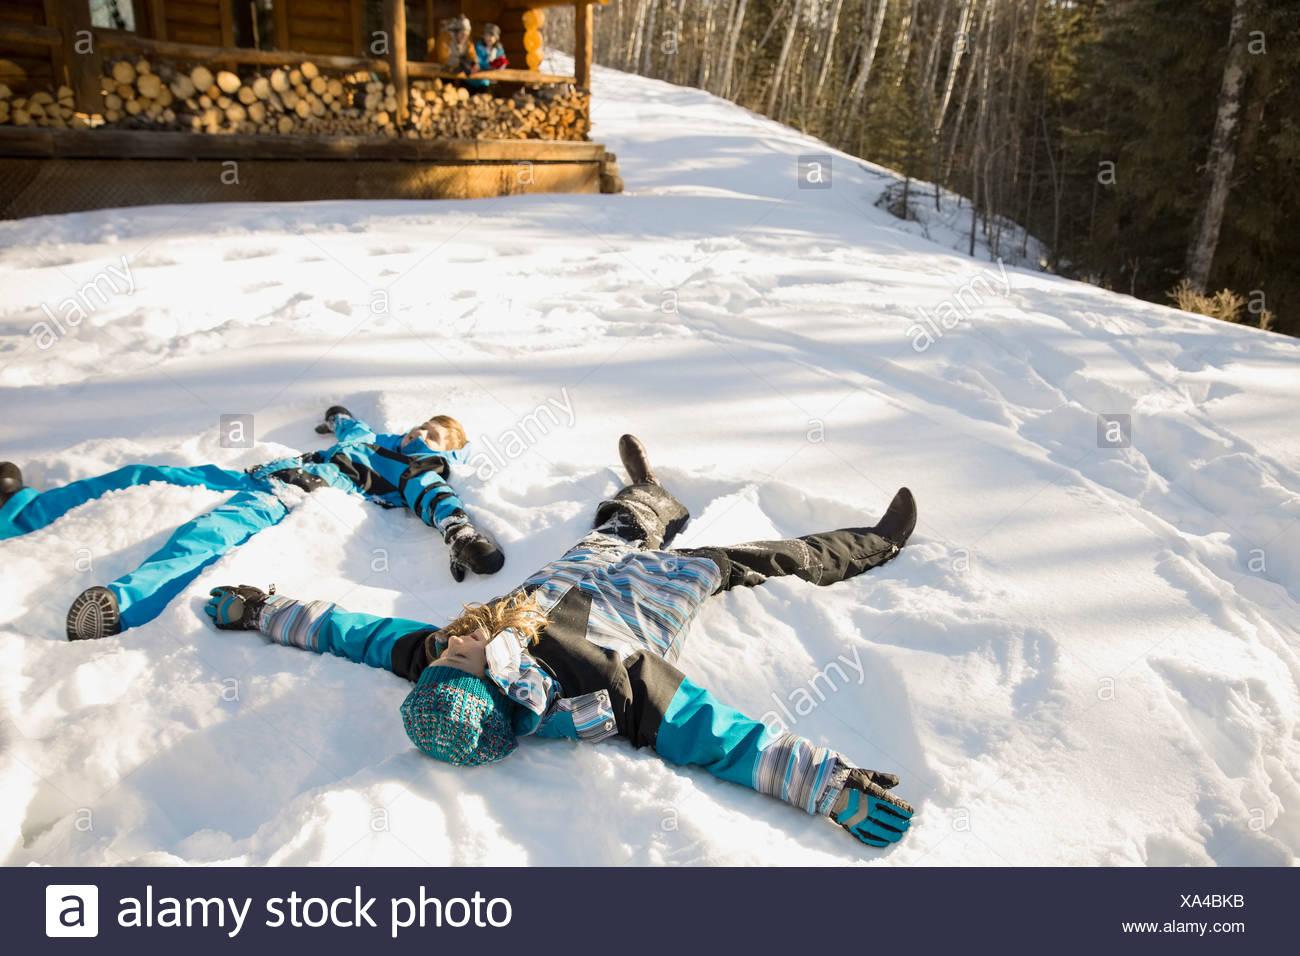 Siblings making snow angels - Stock Image